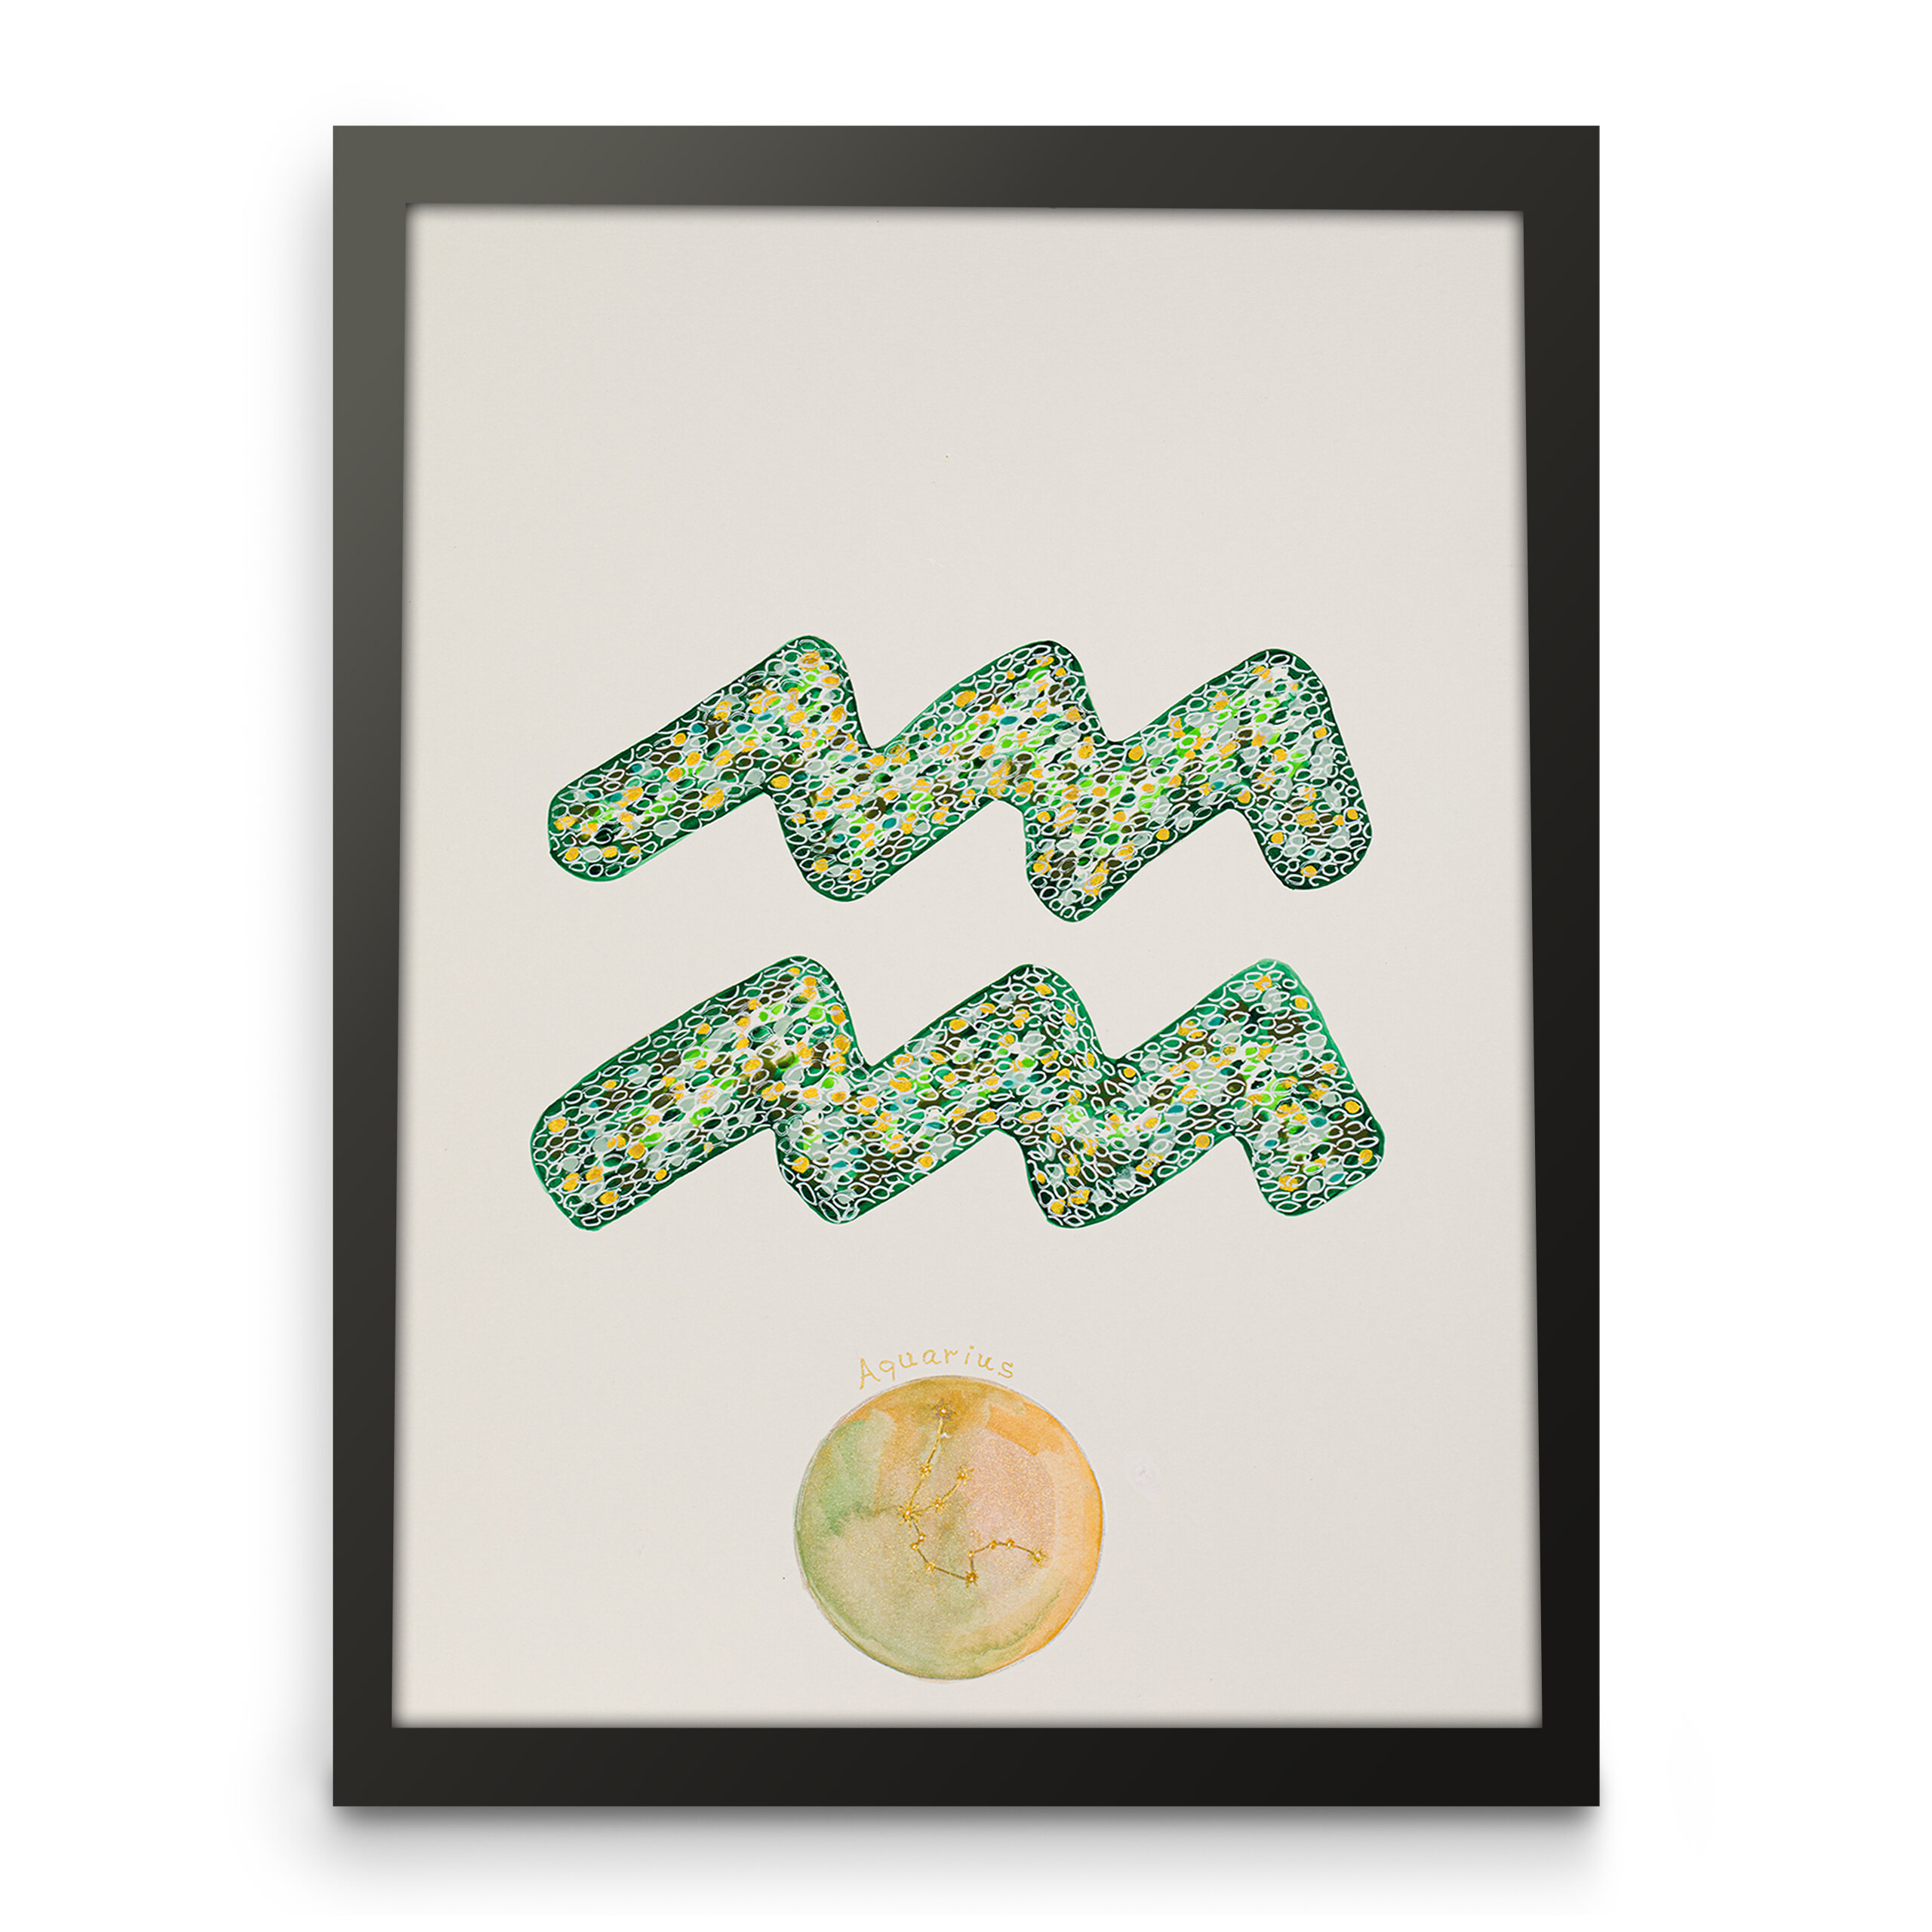 Zodiac art, Aquarius zodiac sign, Framed front view